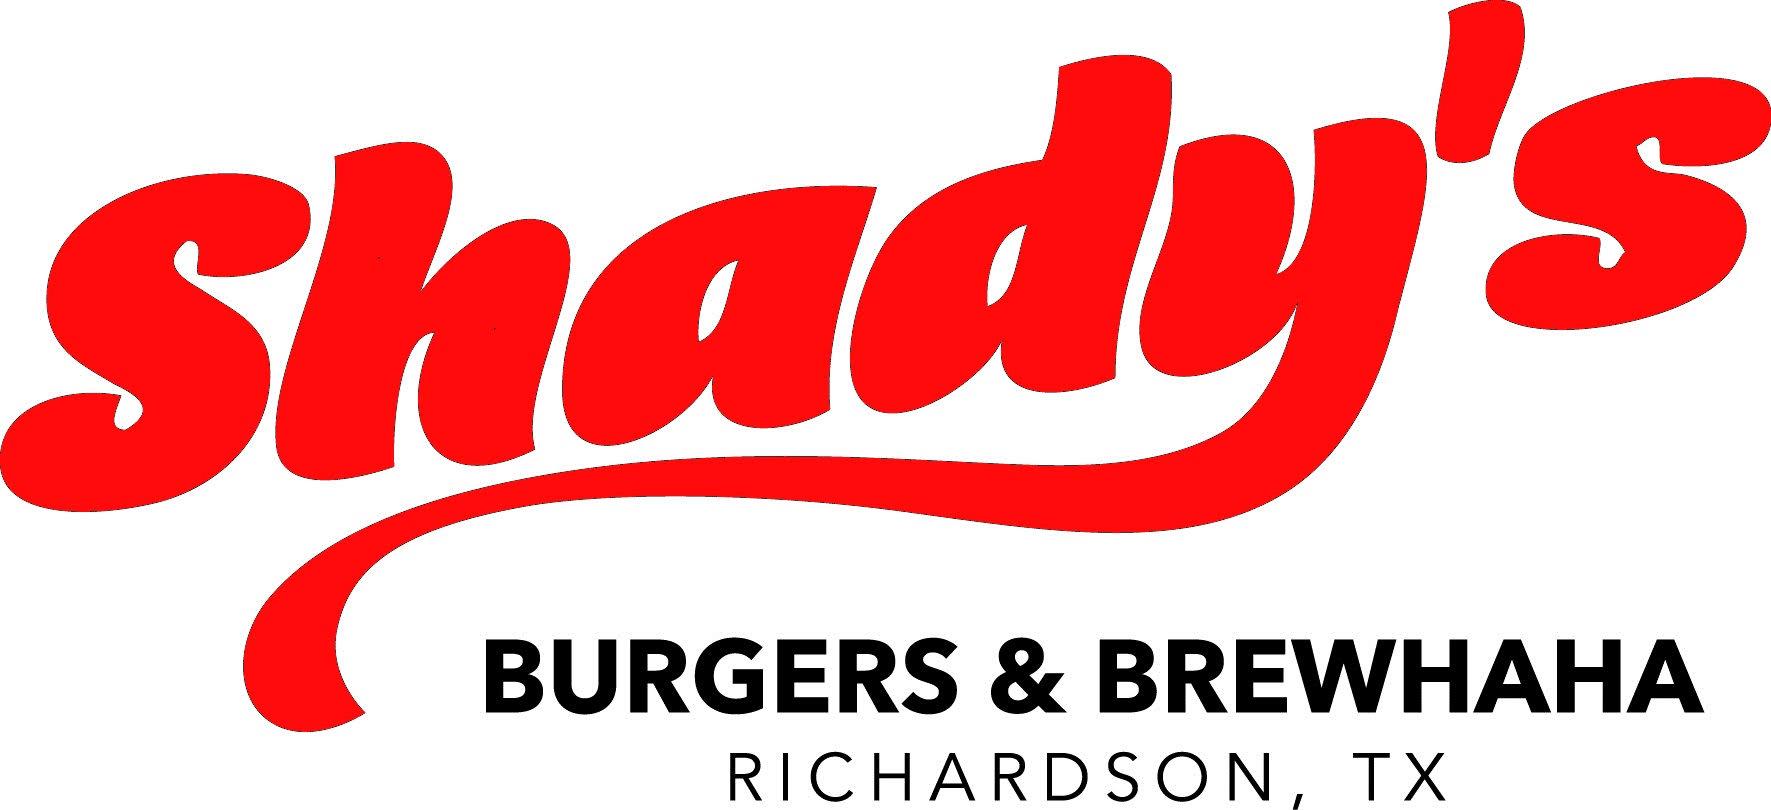 Shady's Burgers